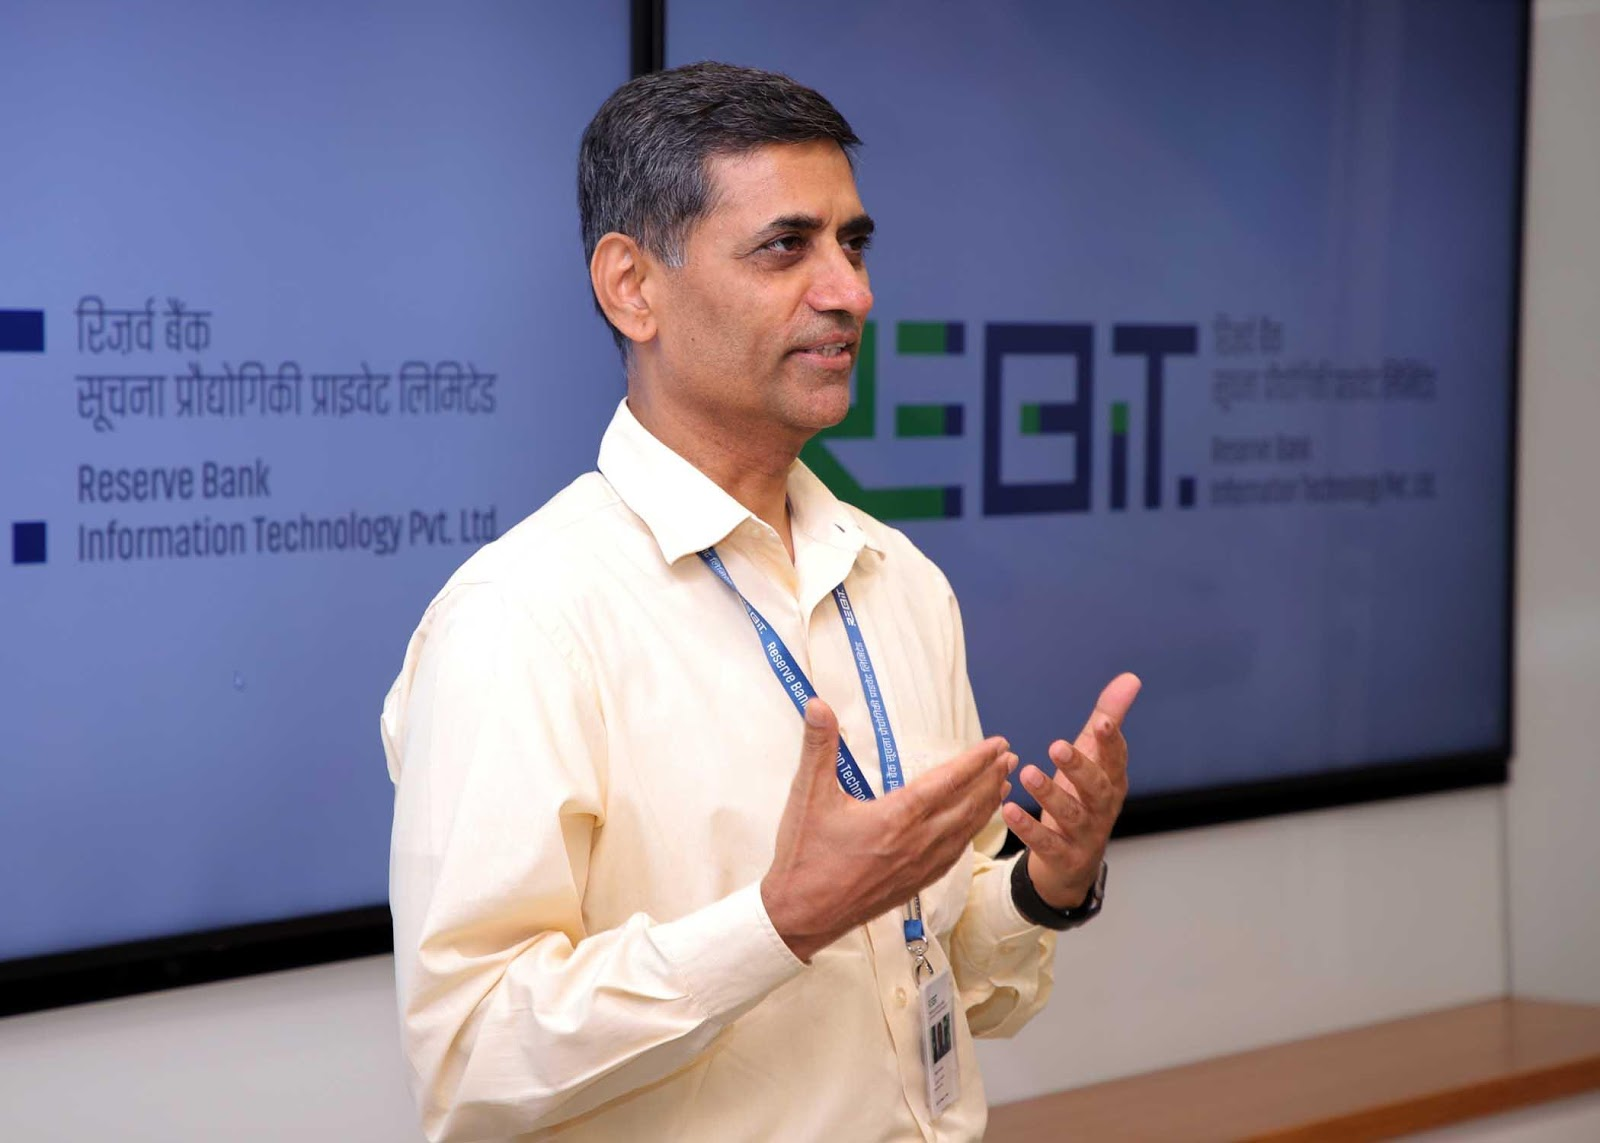 Nandkumar Saravade, CEO, ReBIT.jpg